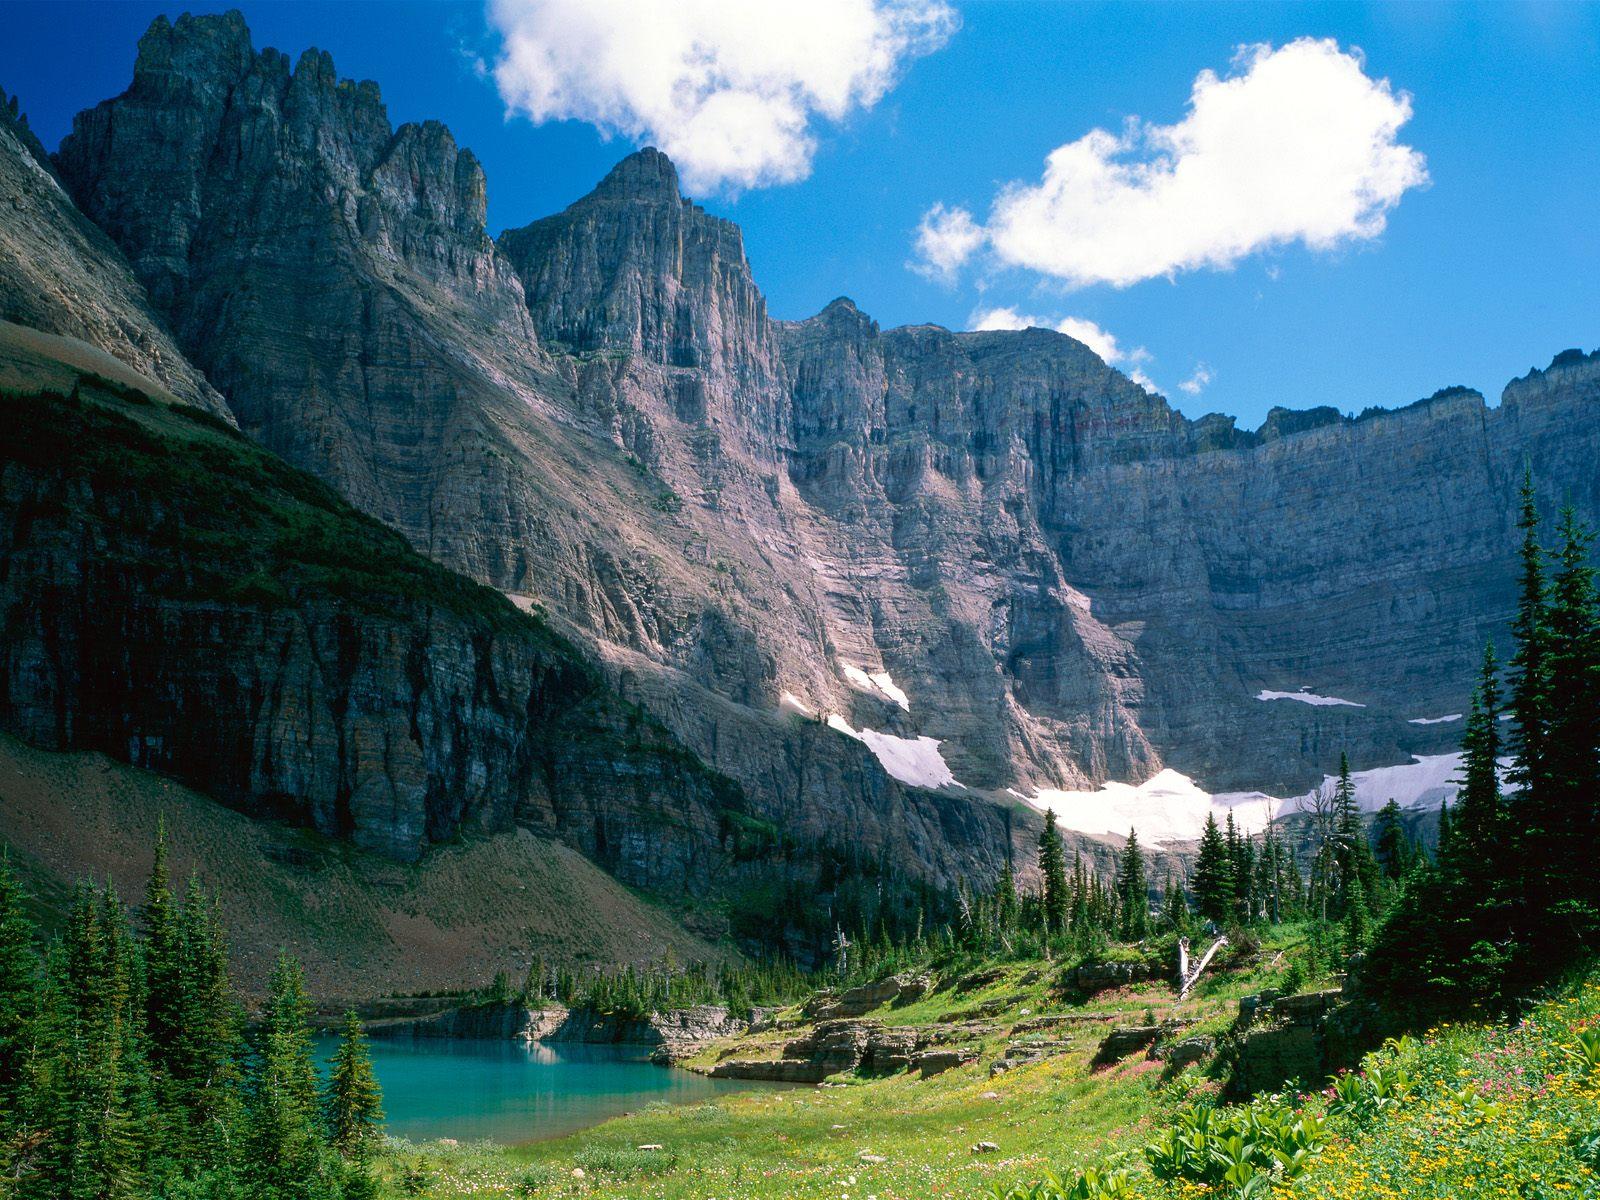 Wallpapers for Desktop Near Iceberg Lake Montana Wallpapers download 1600x1200